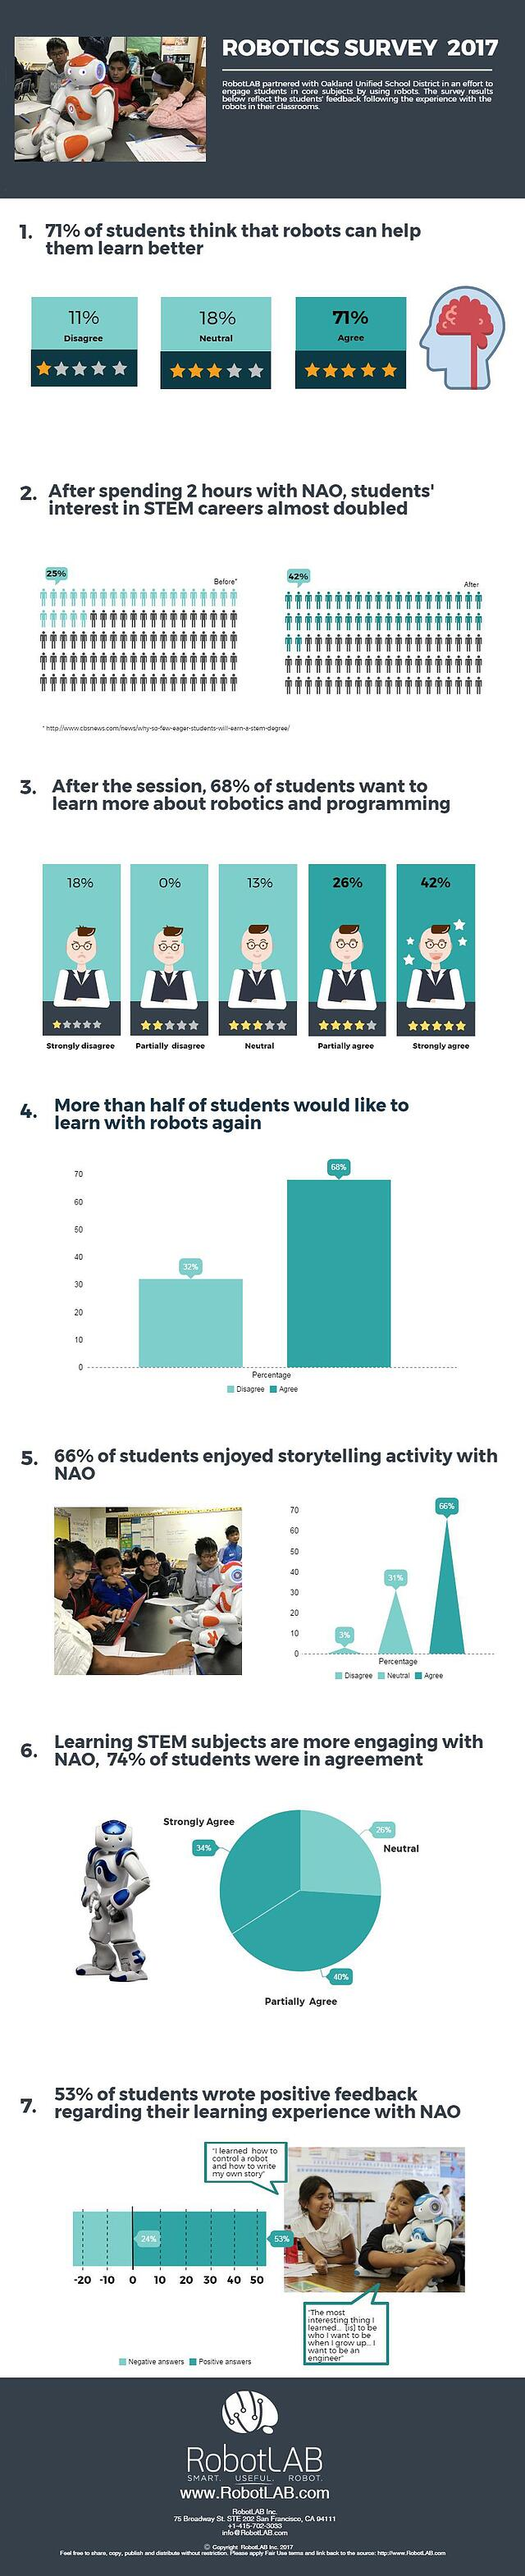 EdTech, STEM, Robotics and Math Education | RobotsLAB Blog